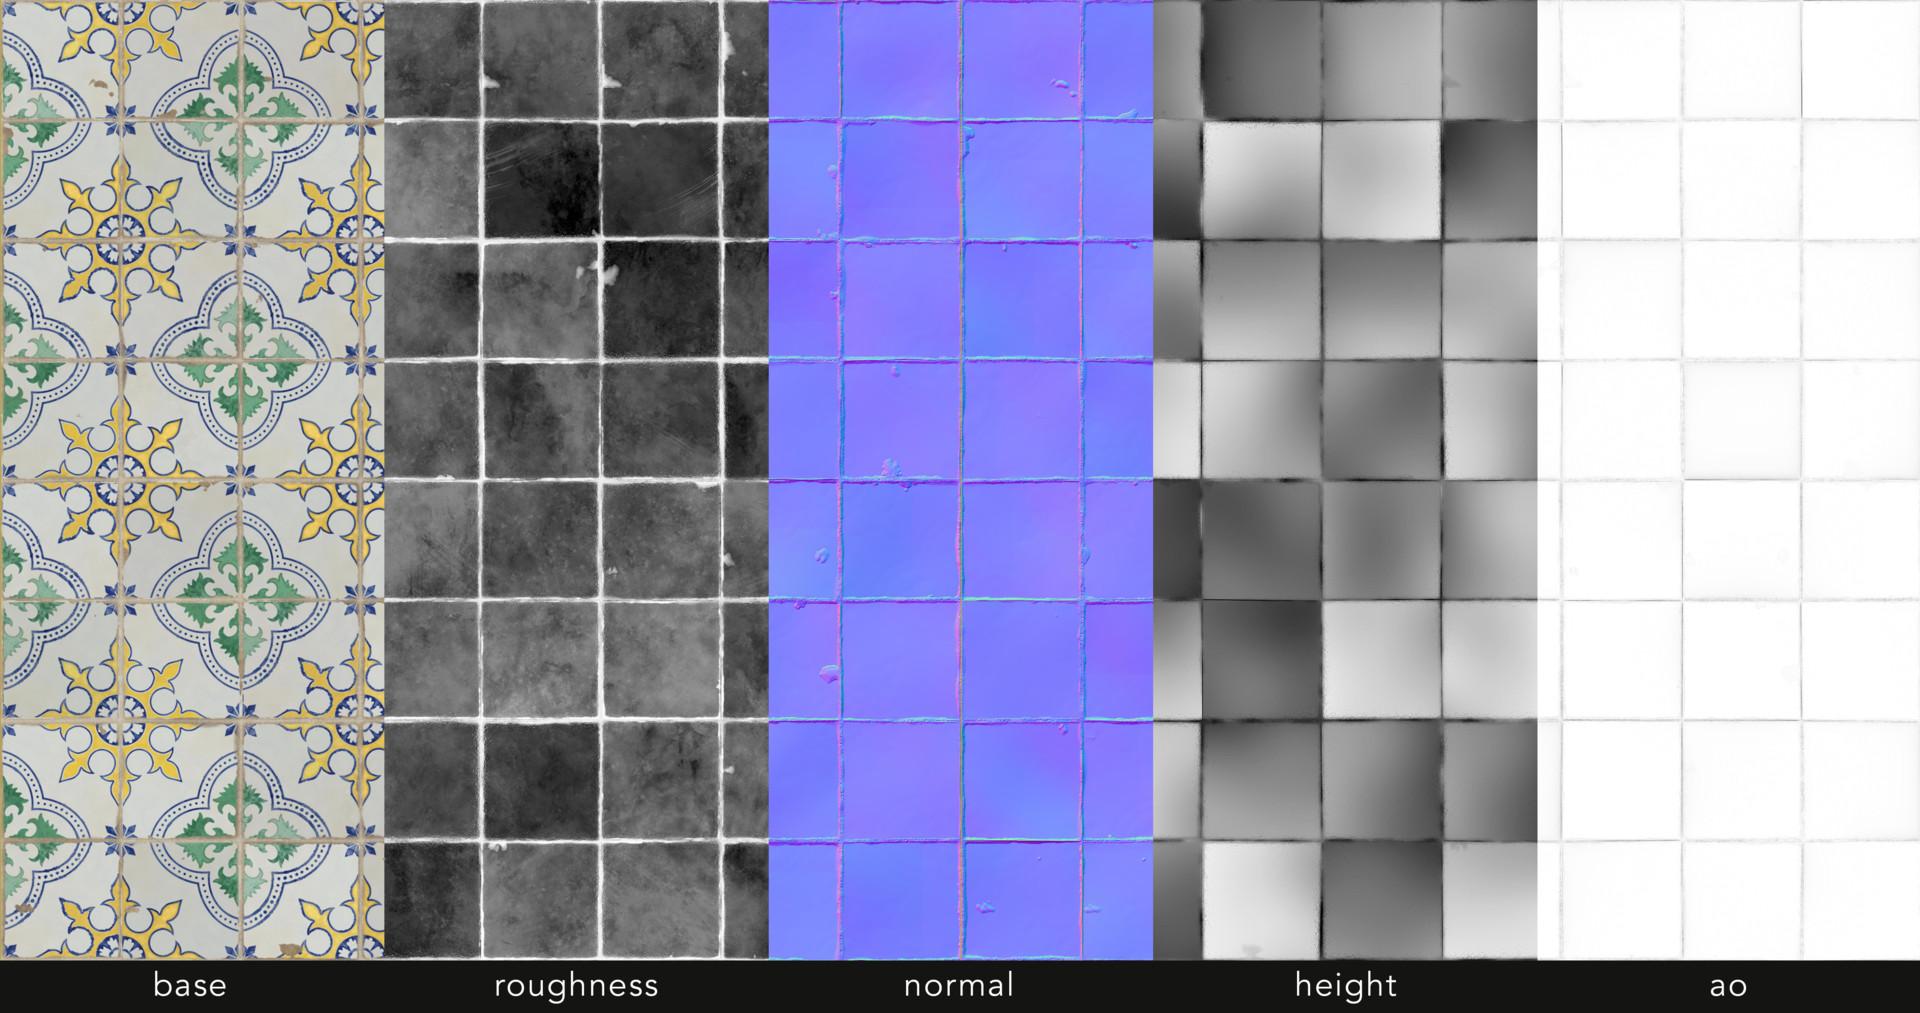 Alina godfrey azulejo tile textures2 psd